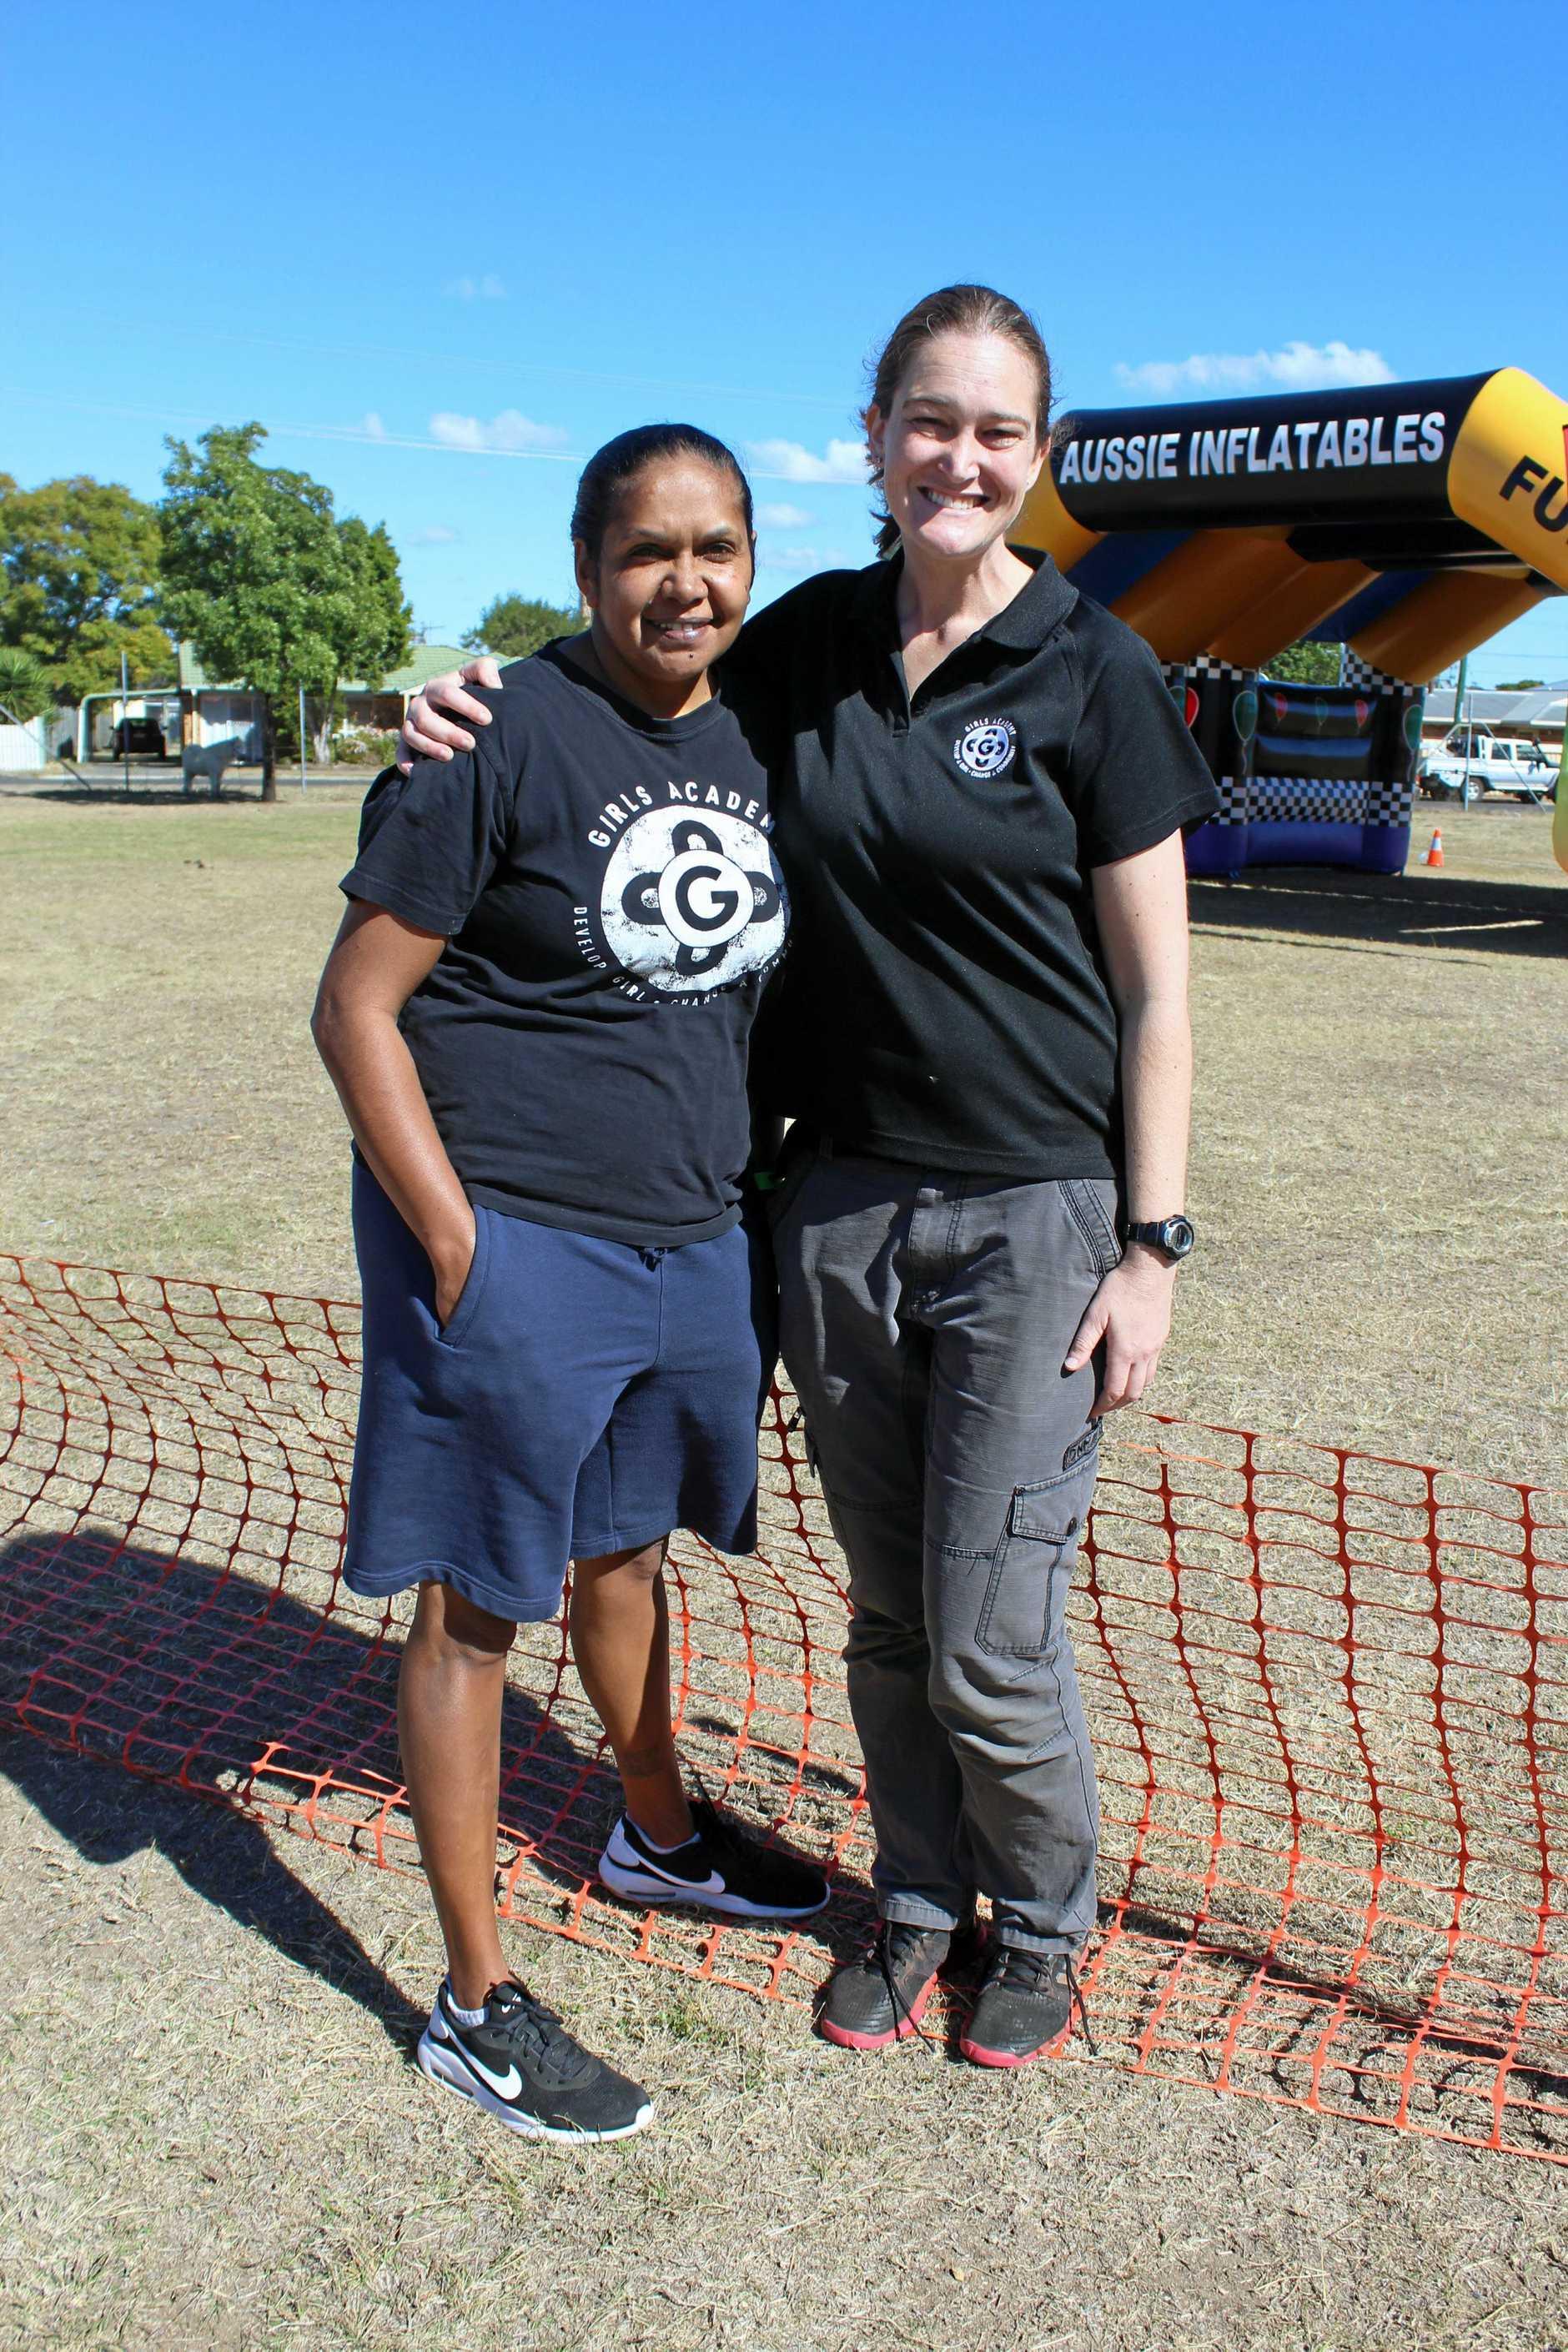 Barrambah Girls Academy development officer Audrey Conlon and program manager Leena Lehtonen enjoy the Murgon Rail Trail Festival.